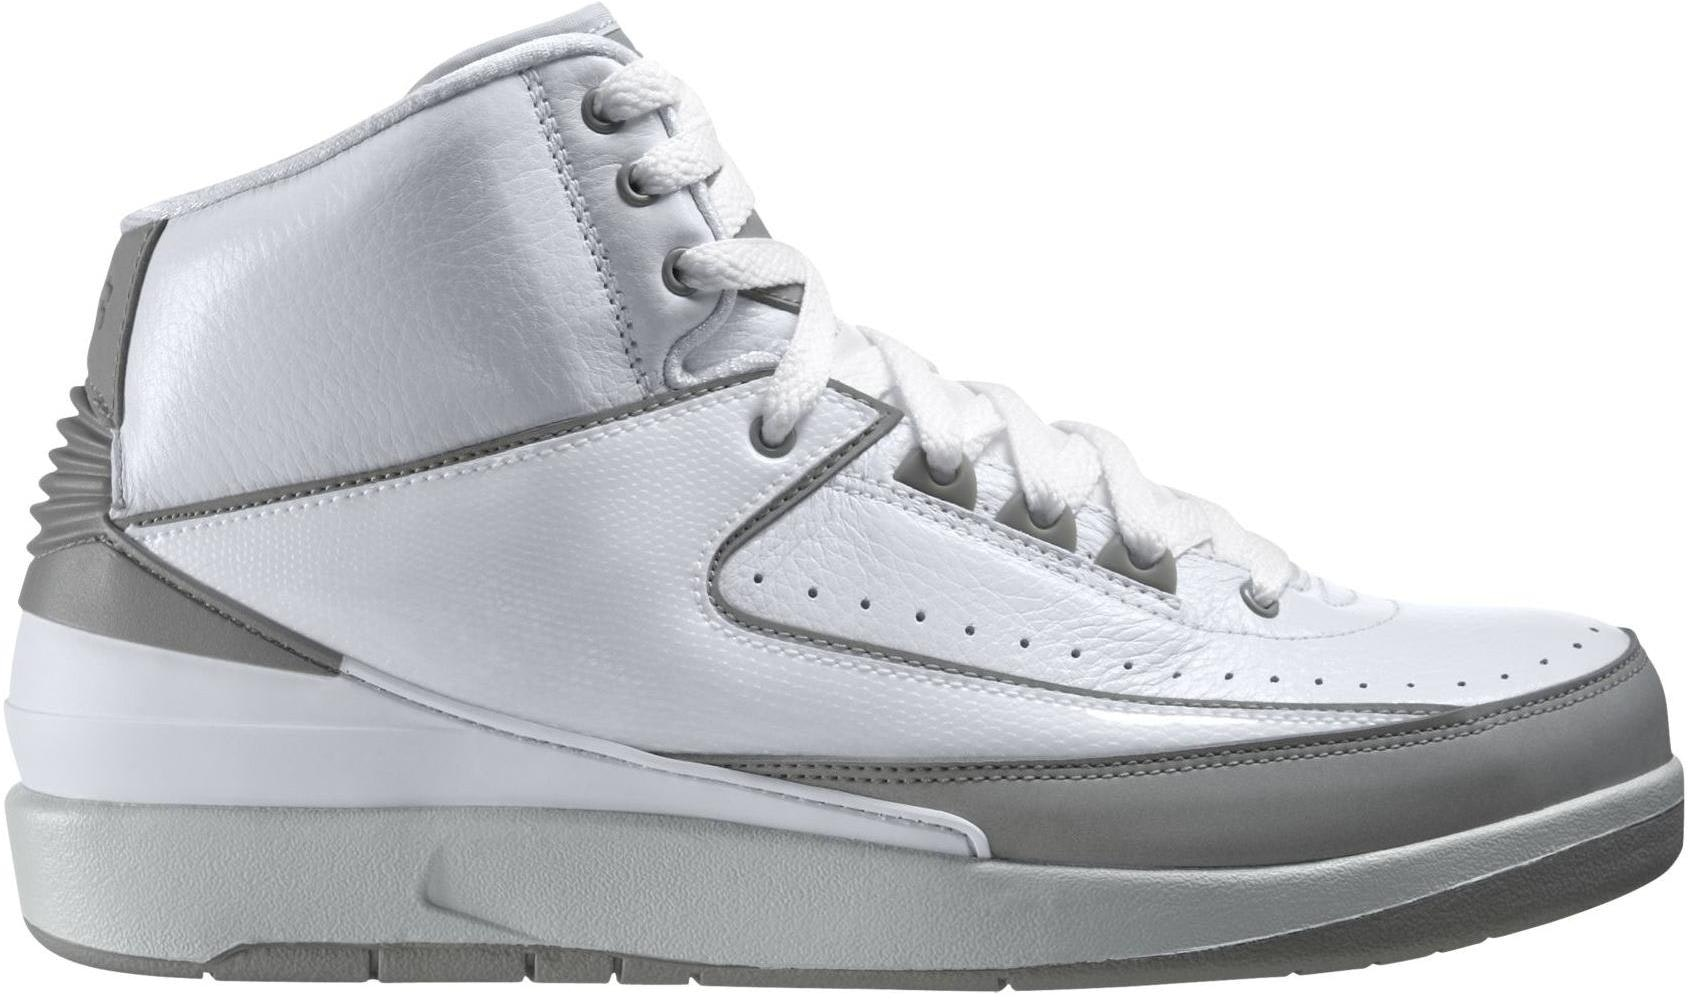 Jordan 2 Retro Silver Anniversary